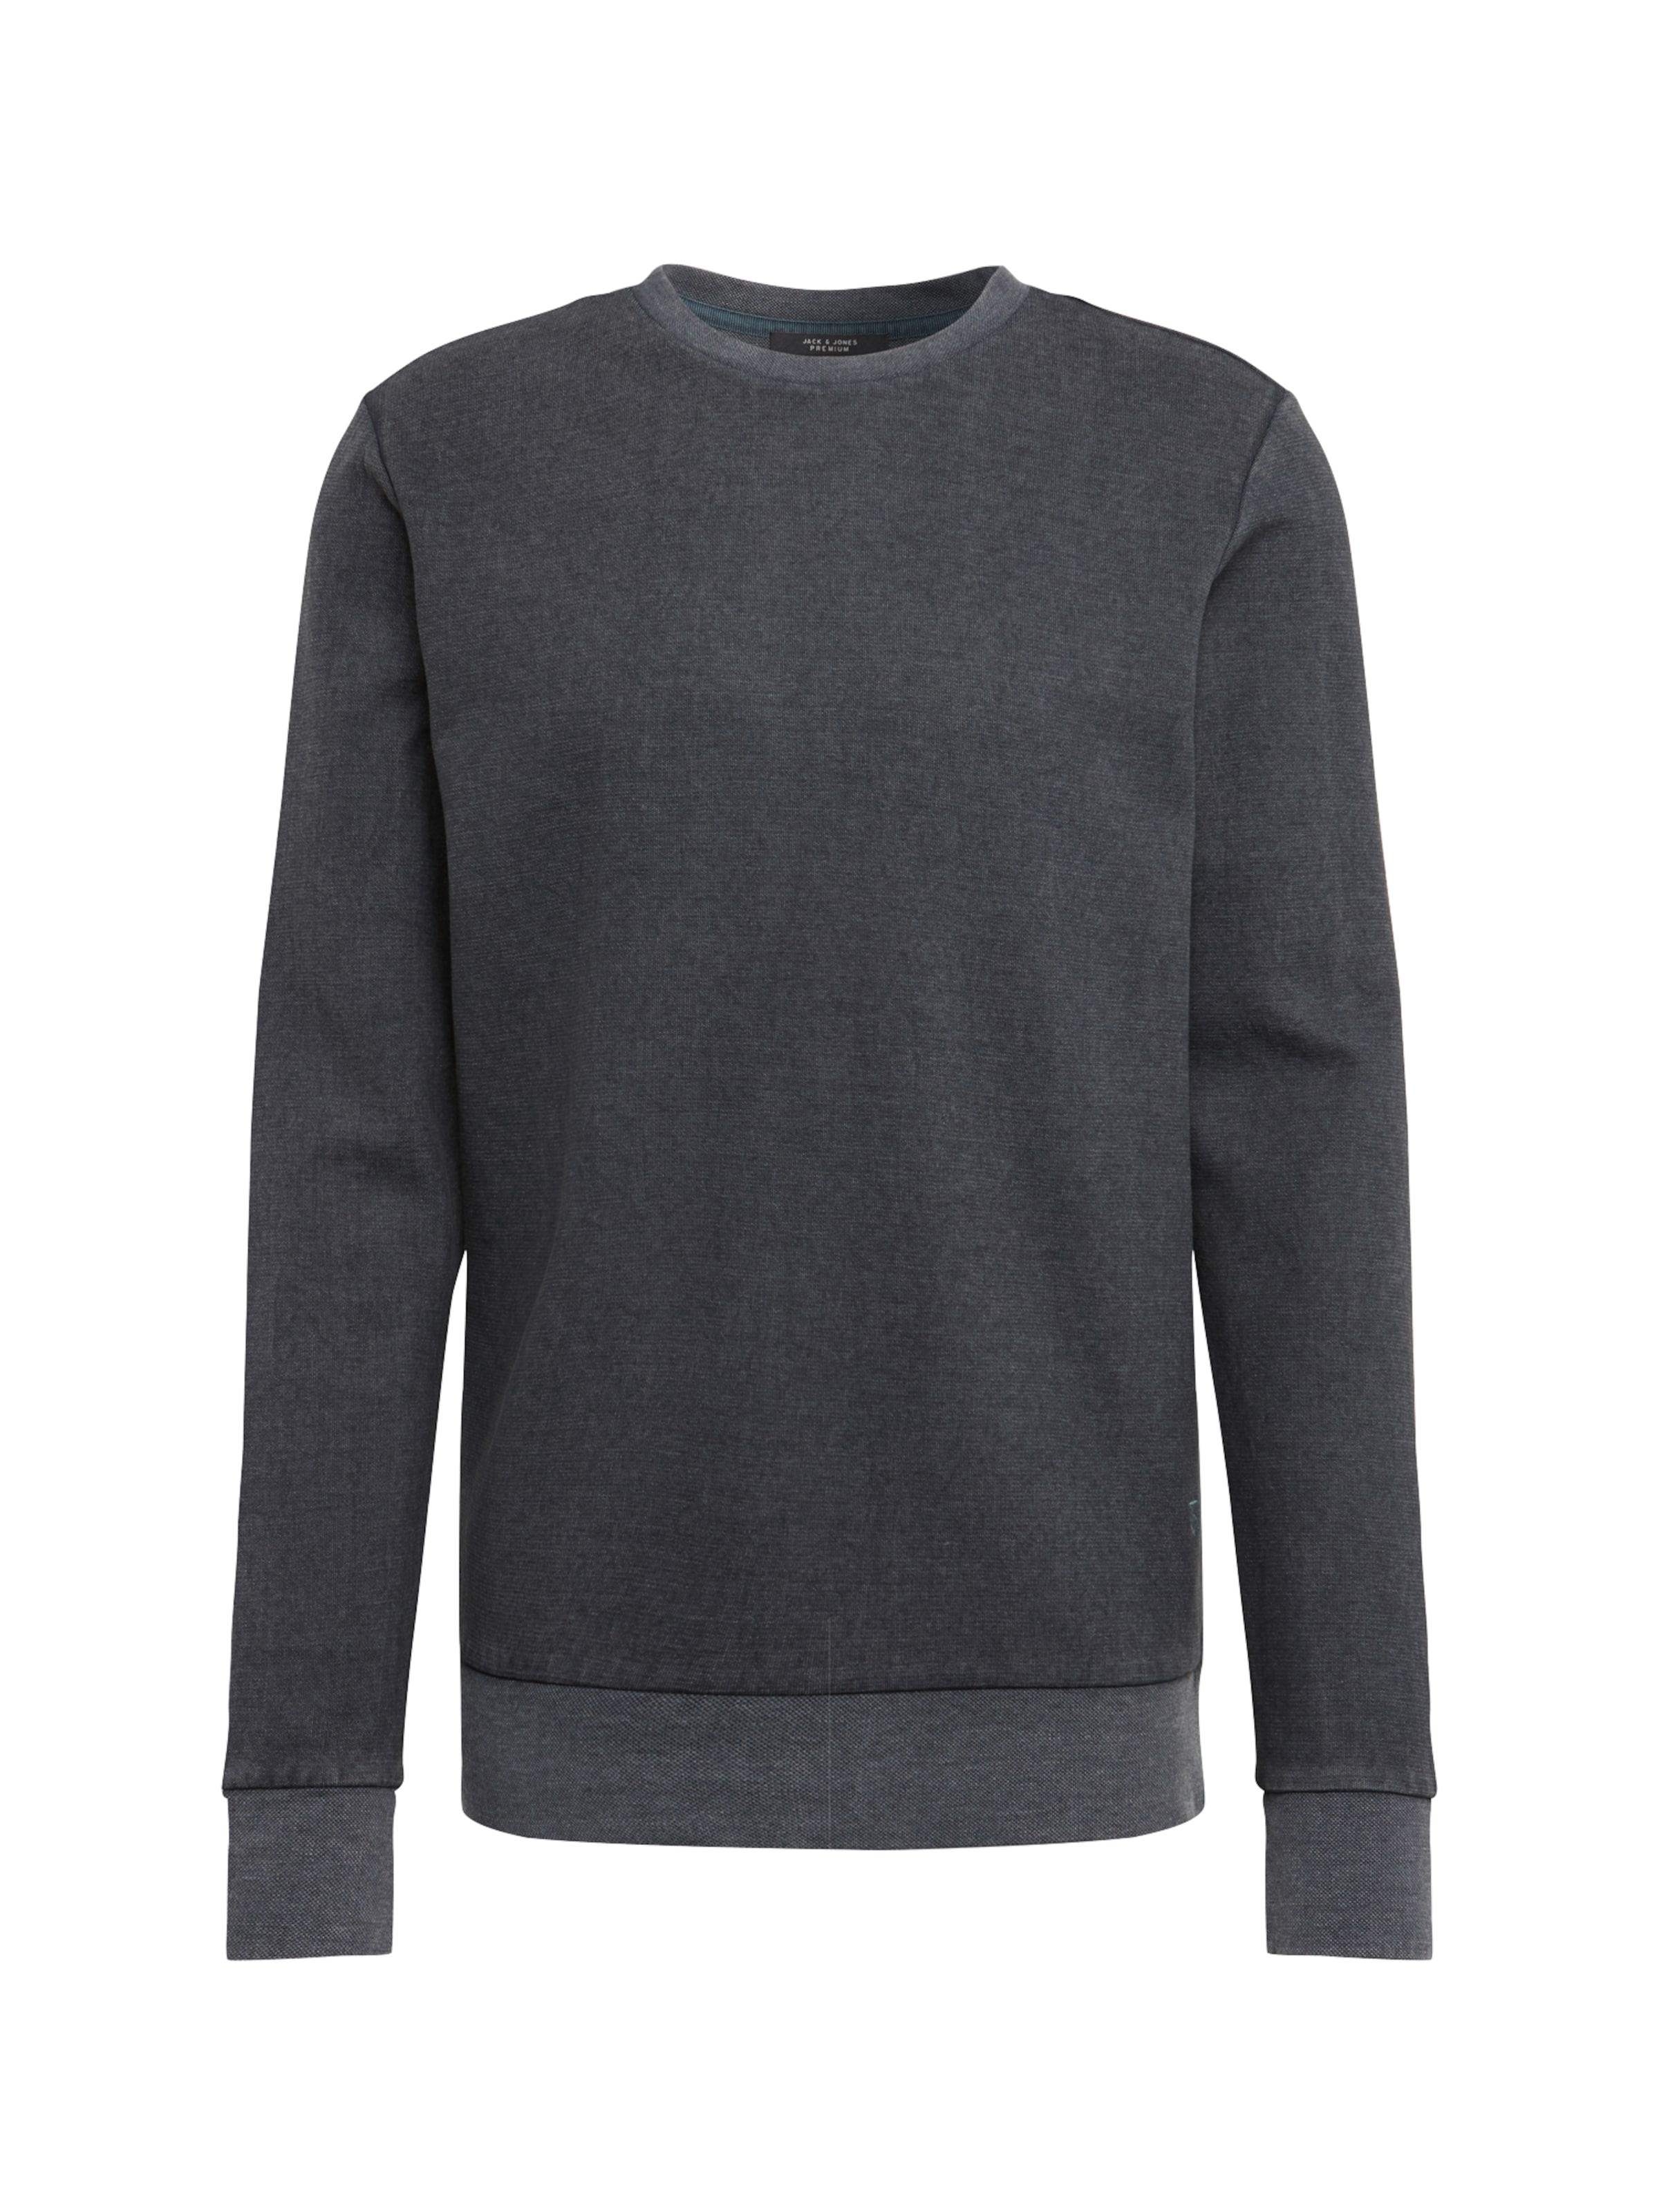 Jones En Sweat shirt Jackamp; Noir kZiPXu